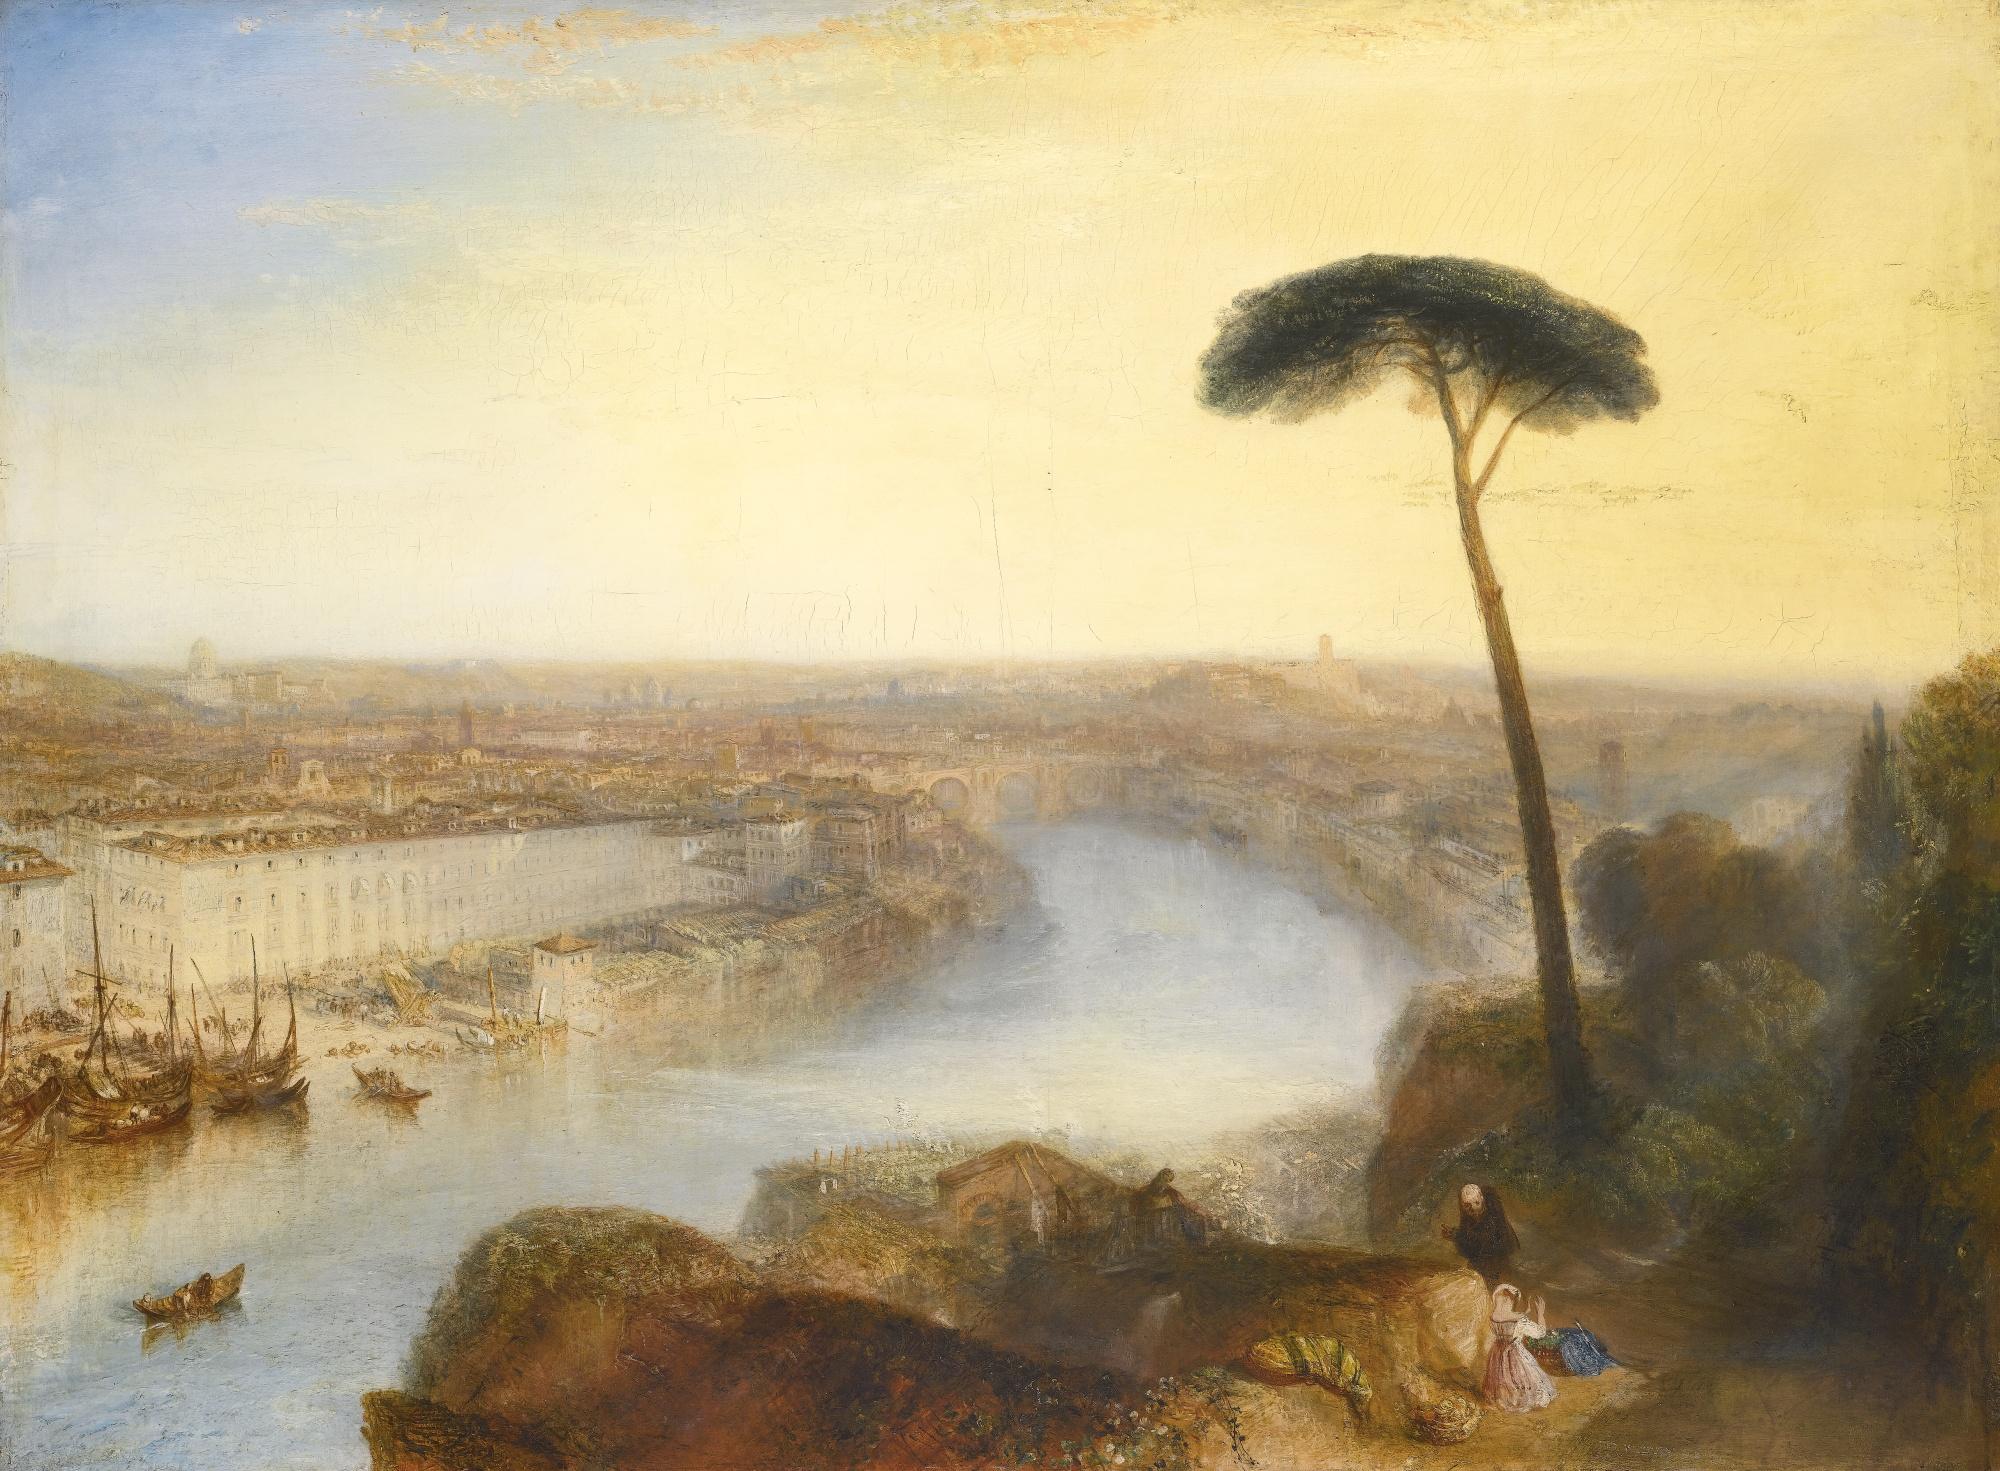 Уильям Тернер картина Вид на Рим с холма Авентин пейзаж